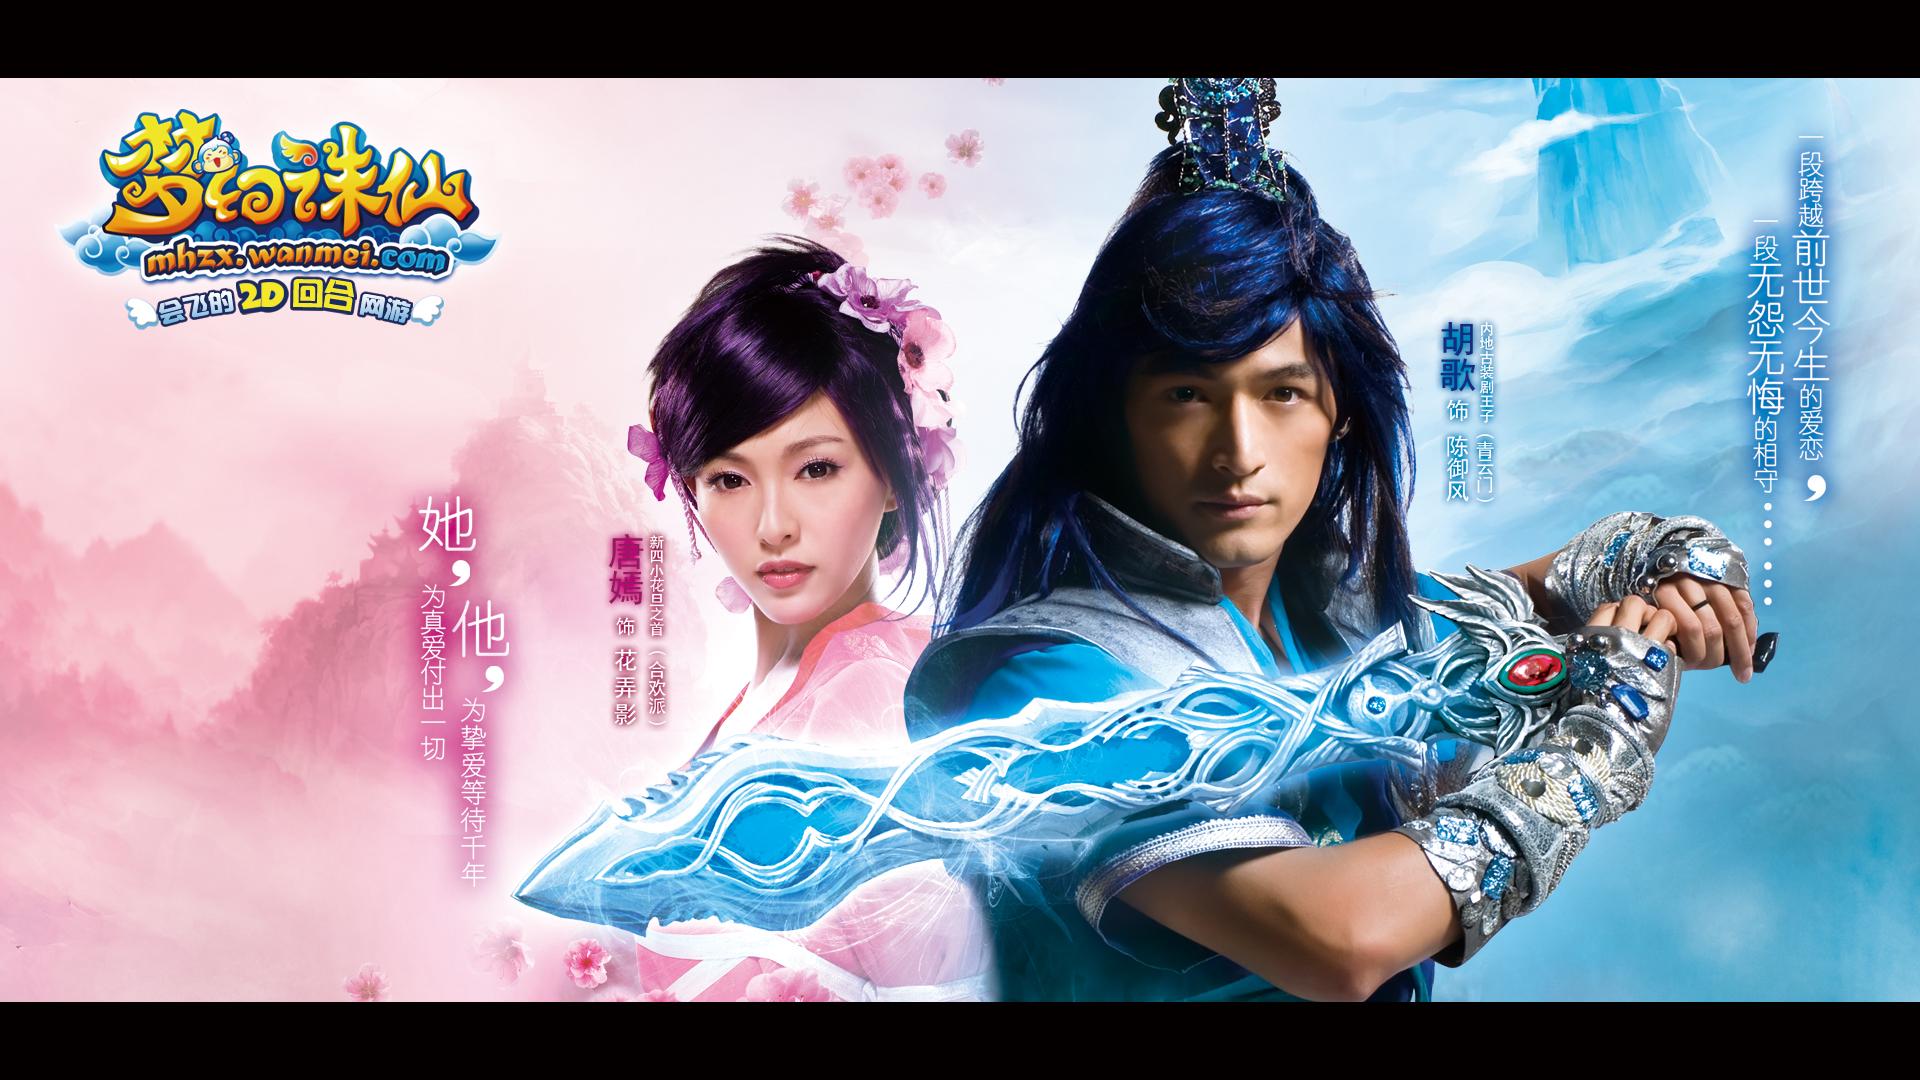 http://mhzx.wanmei.com/userfiles/image/2009-09-30/091006_01.jpg